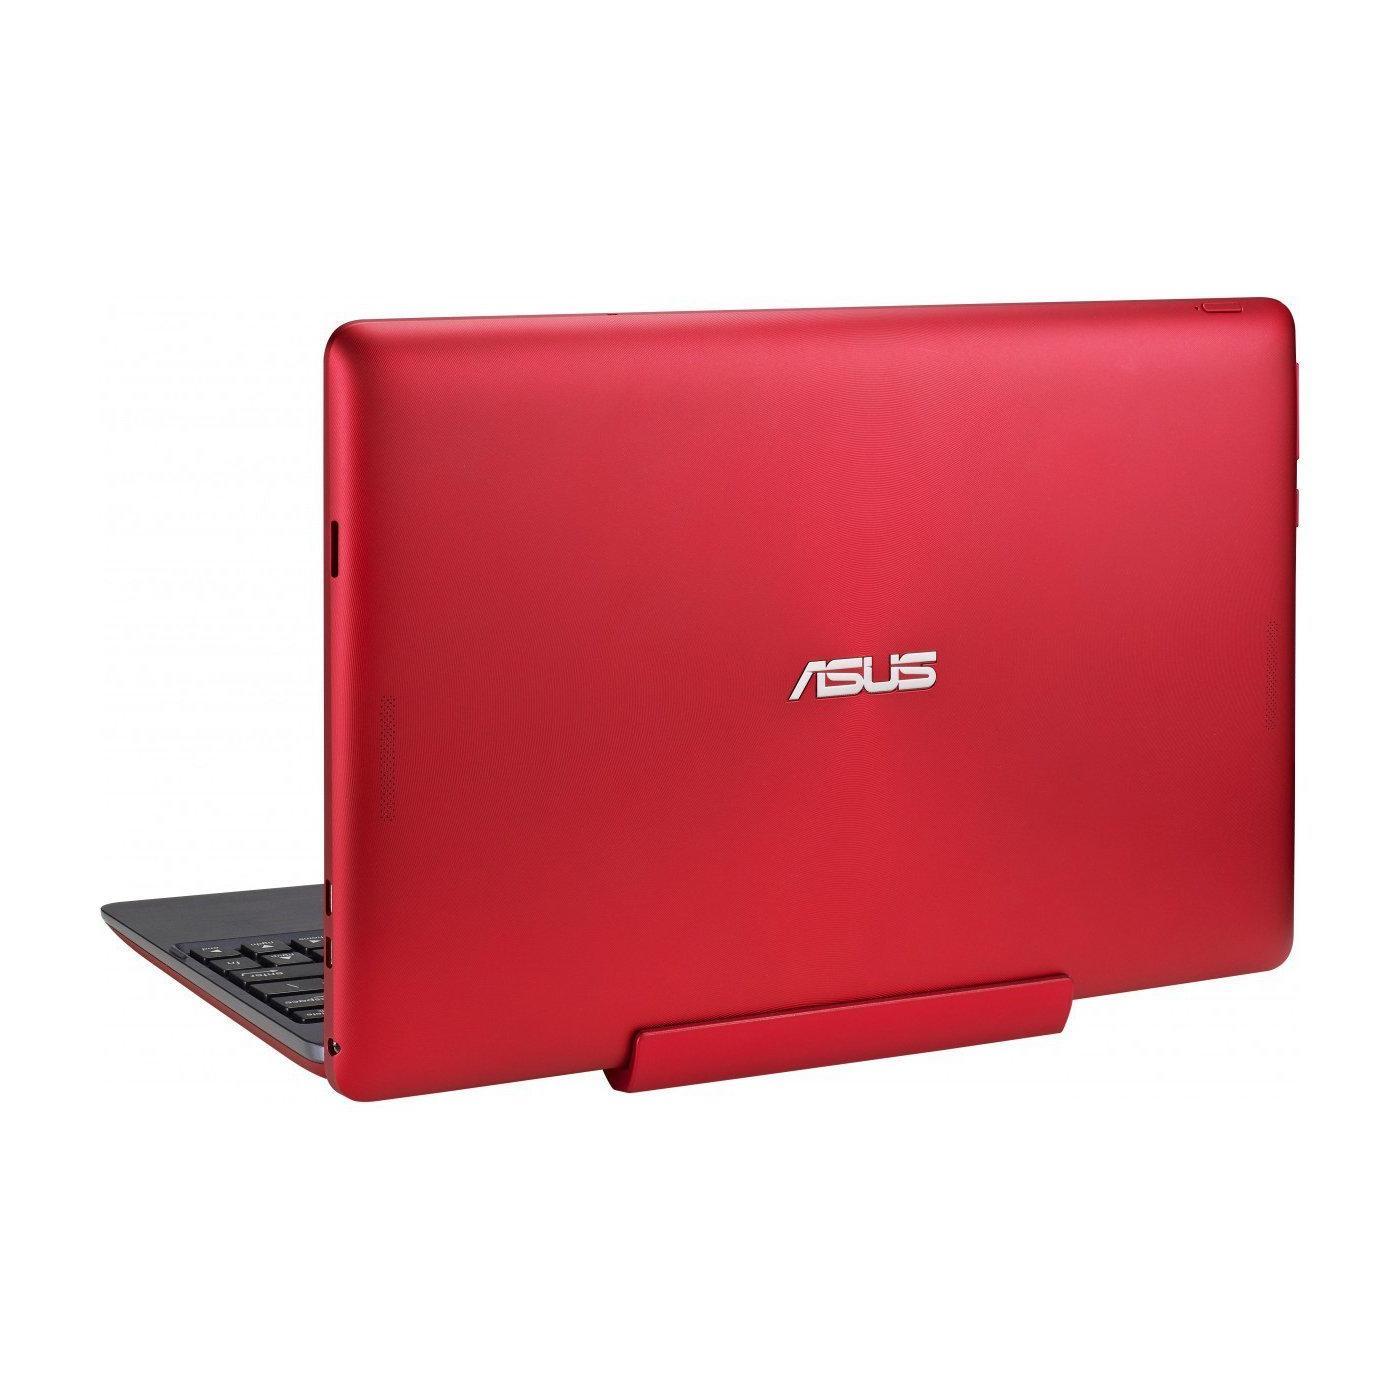 "ASUS Transformer Book T100TAF Rojo 10.1"" Intel Atom - RAM 2GB - eMMC 32GB + HDD 500GB - QWERTY"